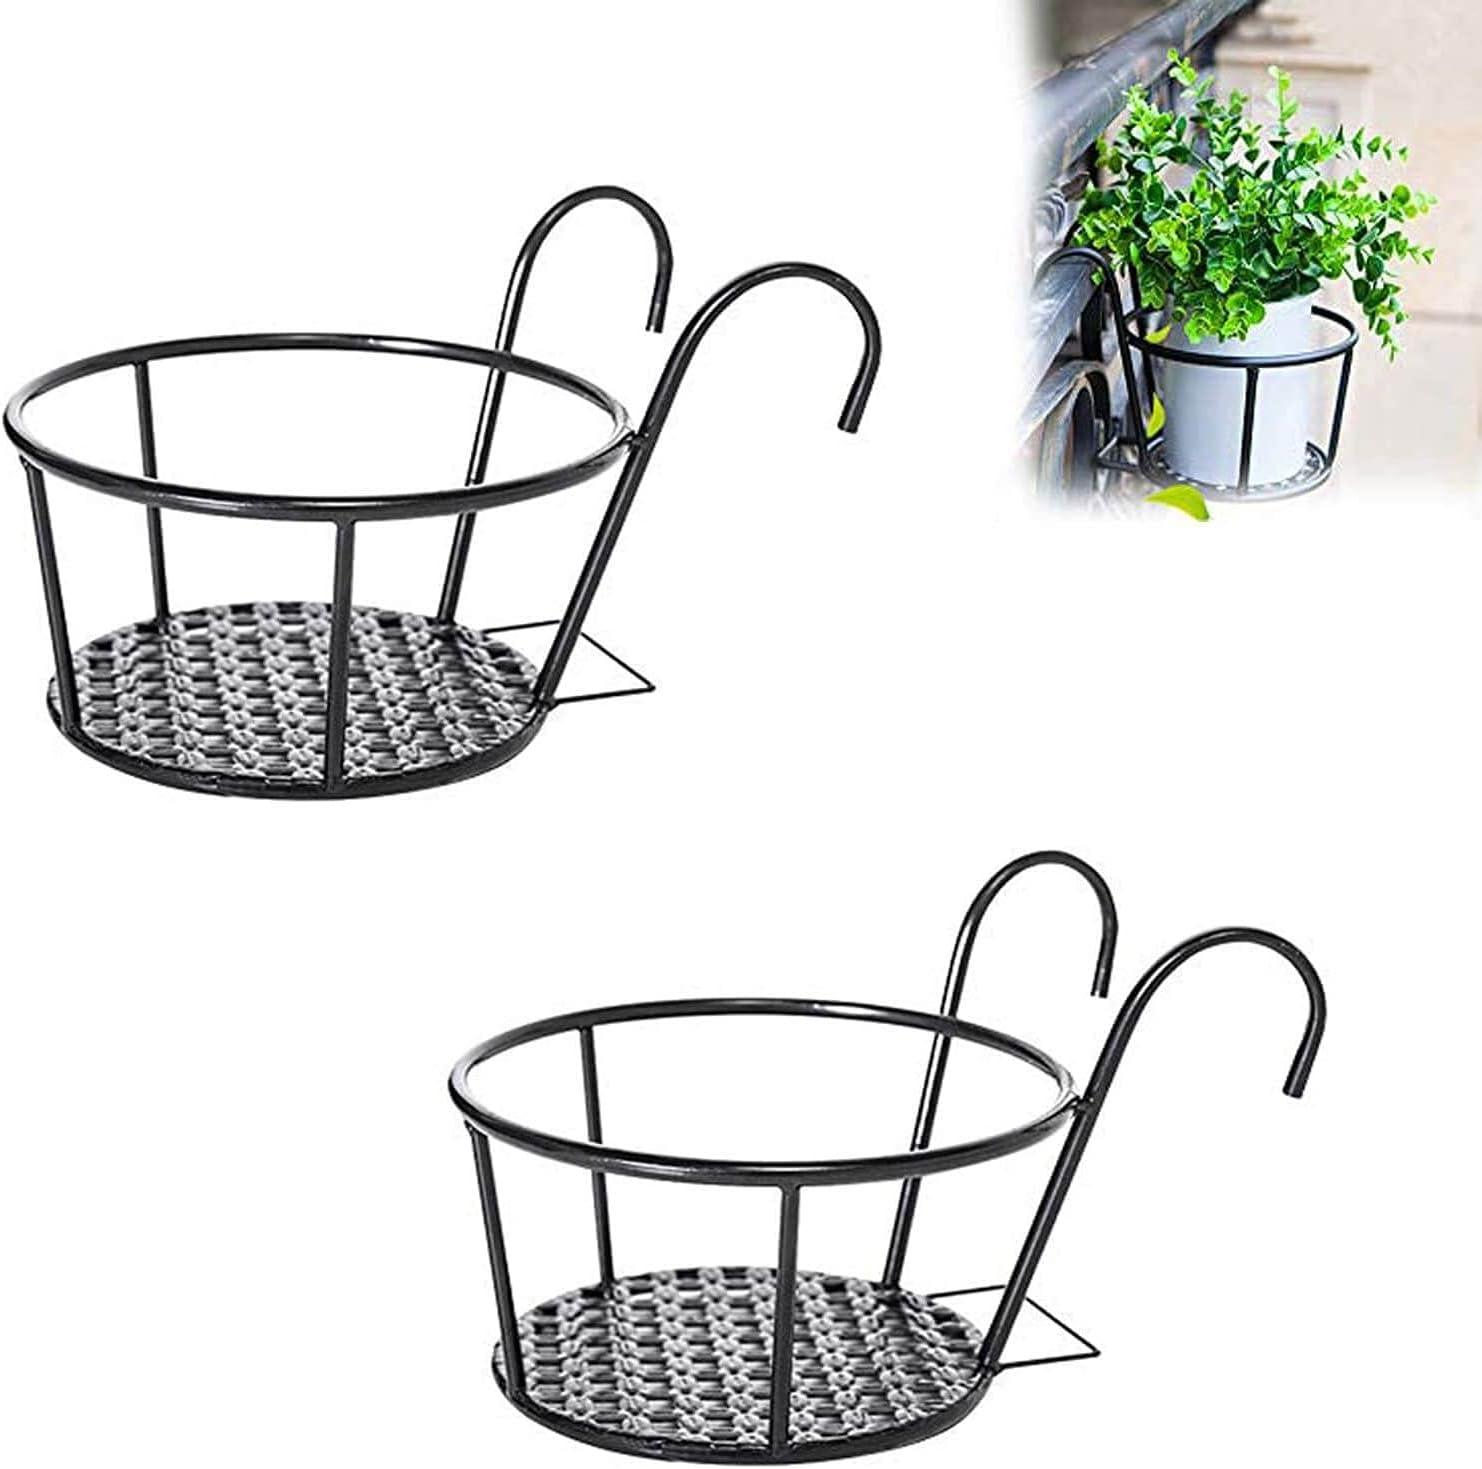 Hanging Max 49% OFF depot Railing Planters Baskets Basket Balcony Holder Plan Pot